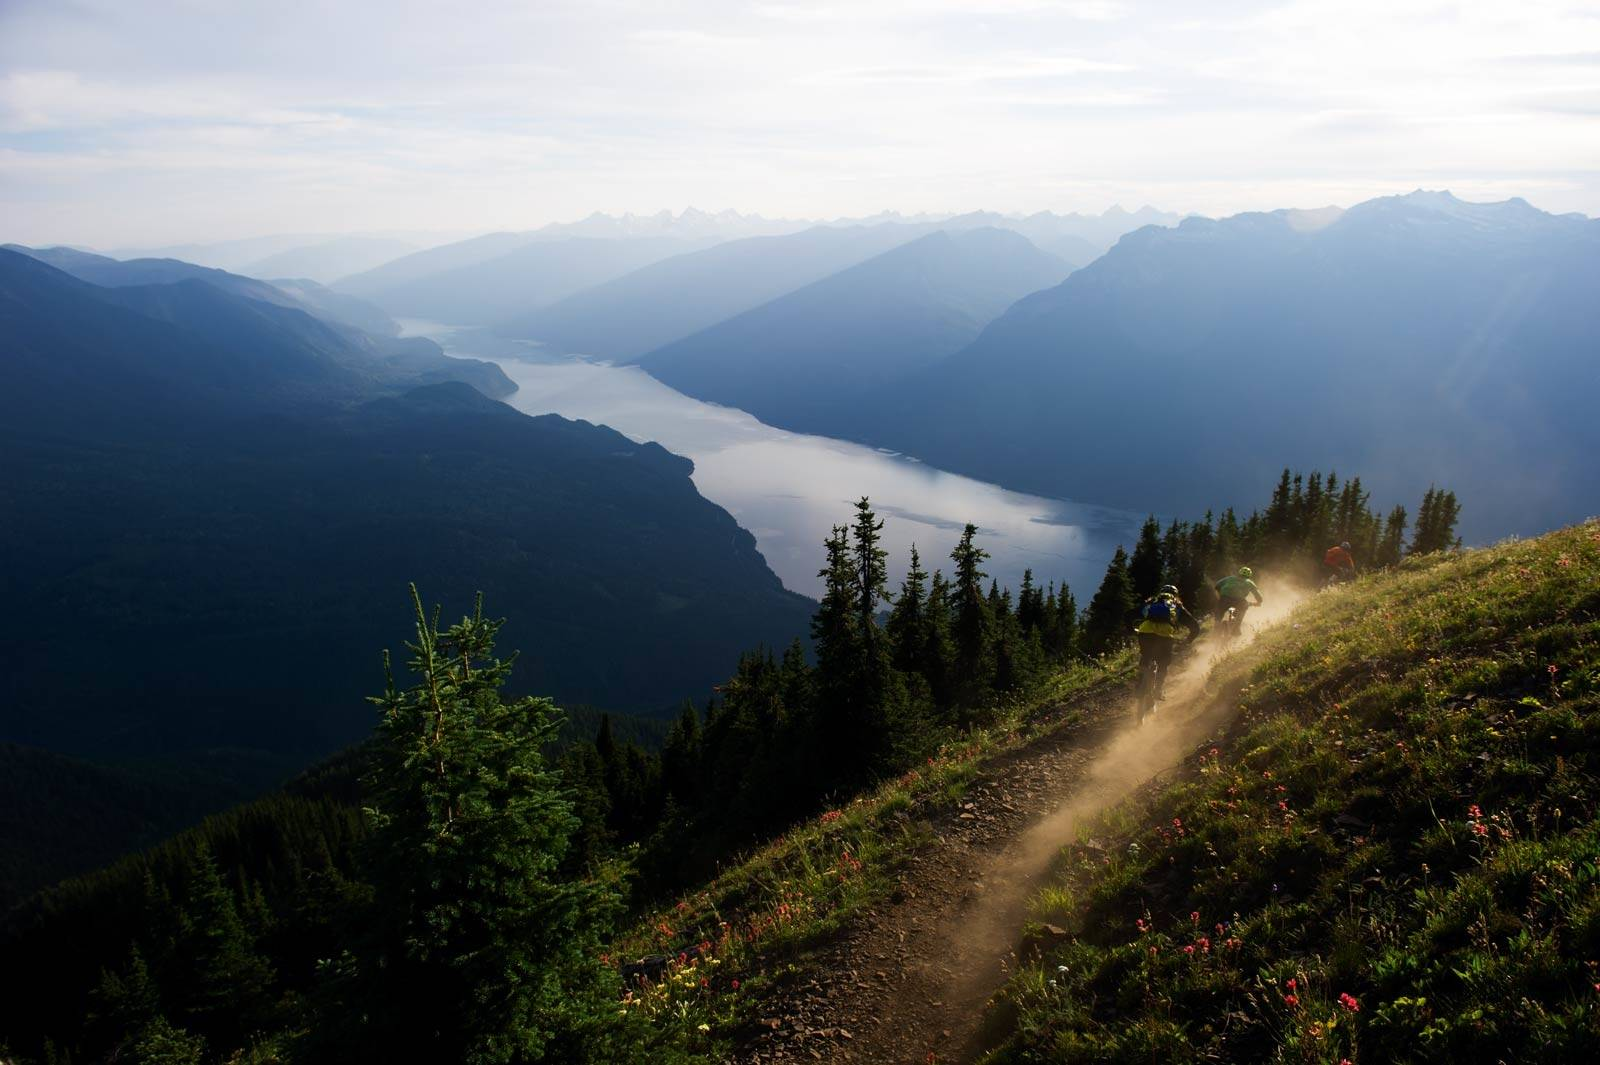 Stisykling-guide-British-Columbia-2